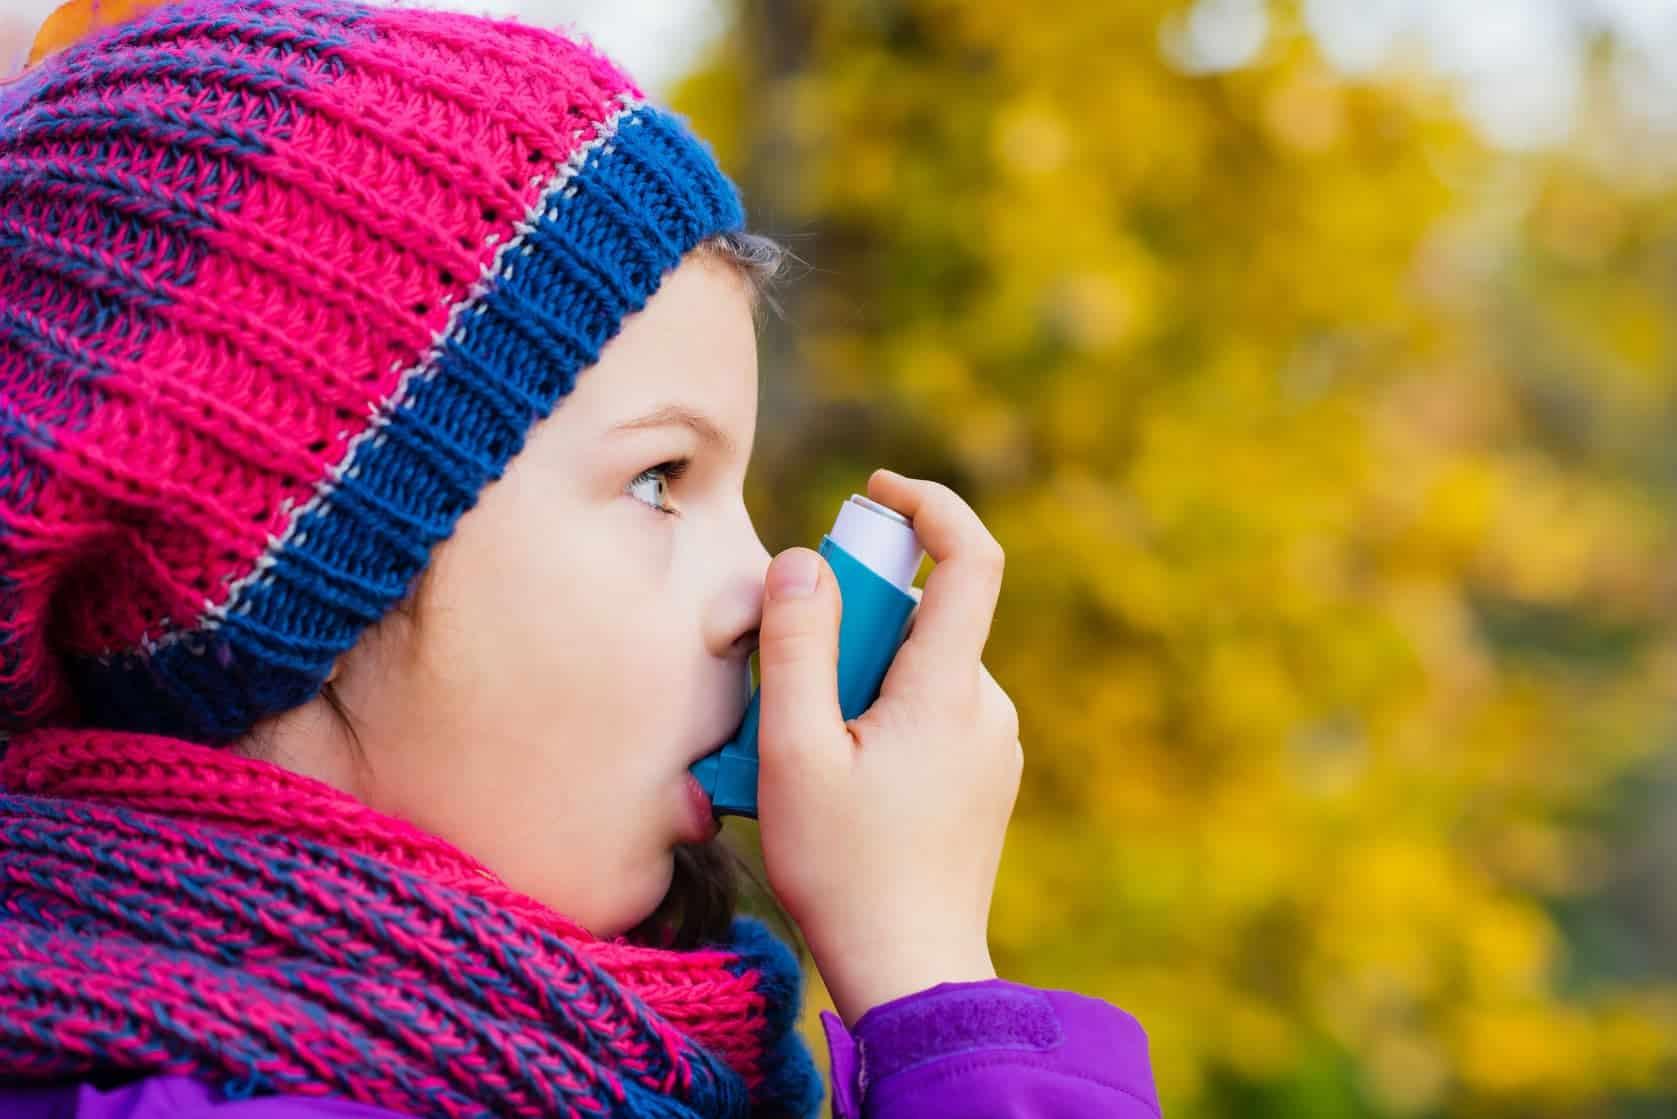 Asthma under contol